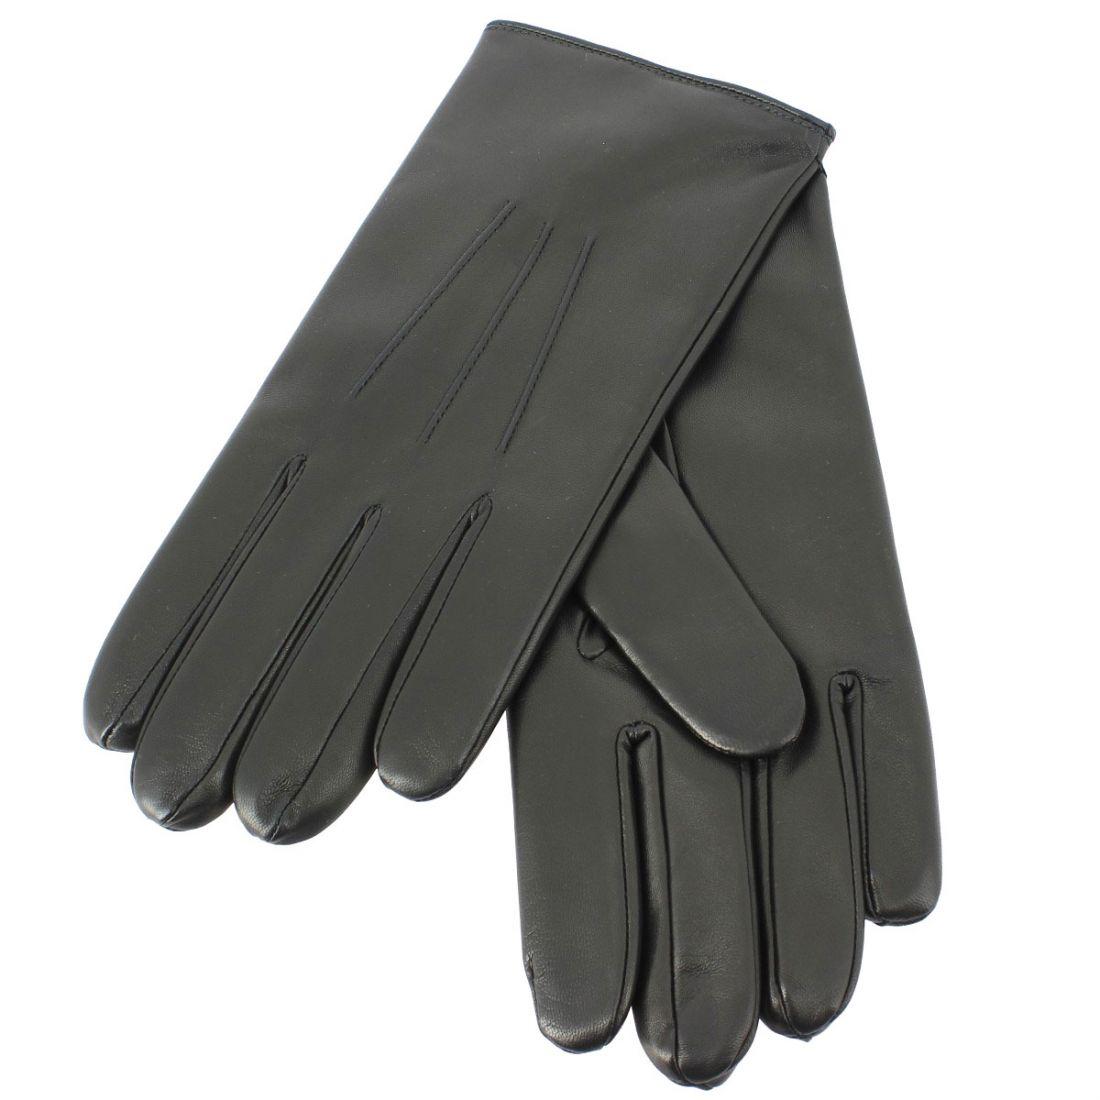 882b56c756a7b Gants cuir noir Luxe, Nappa-cachemire, fait main en Italie.